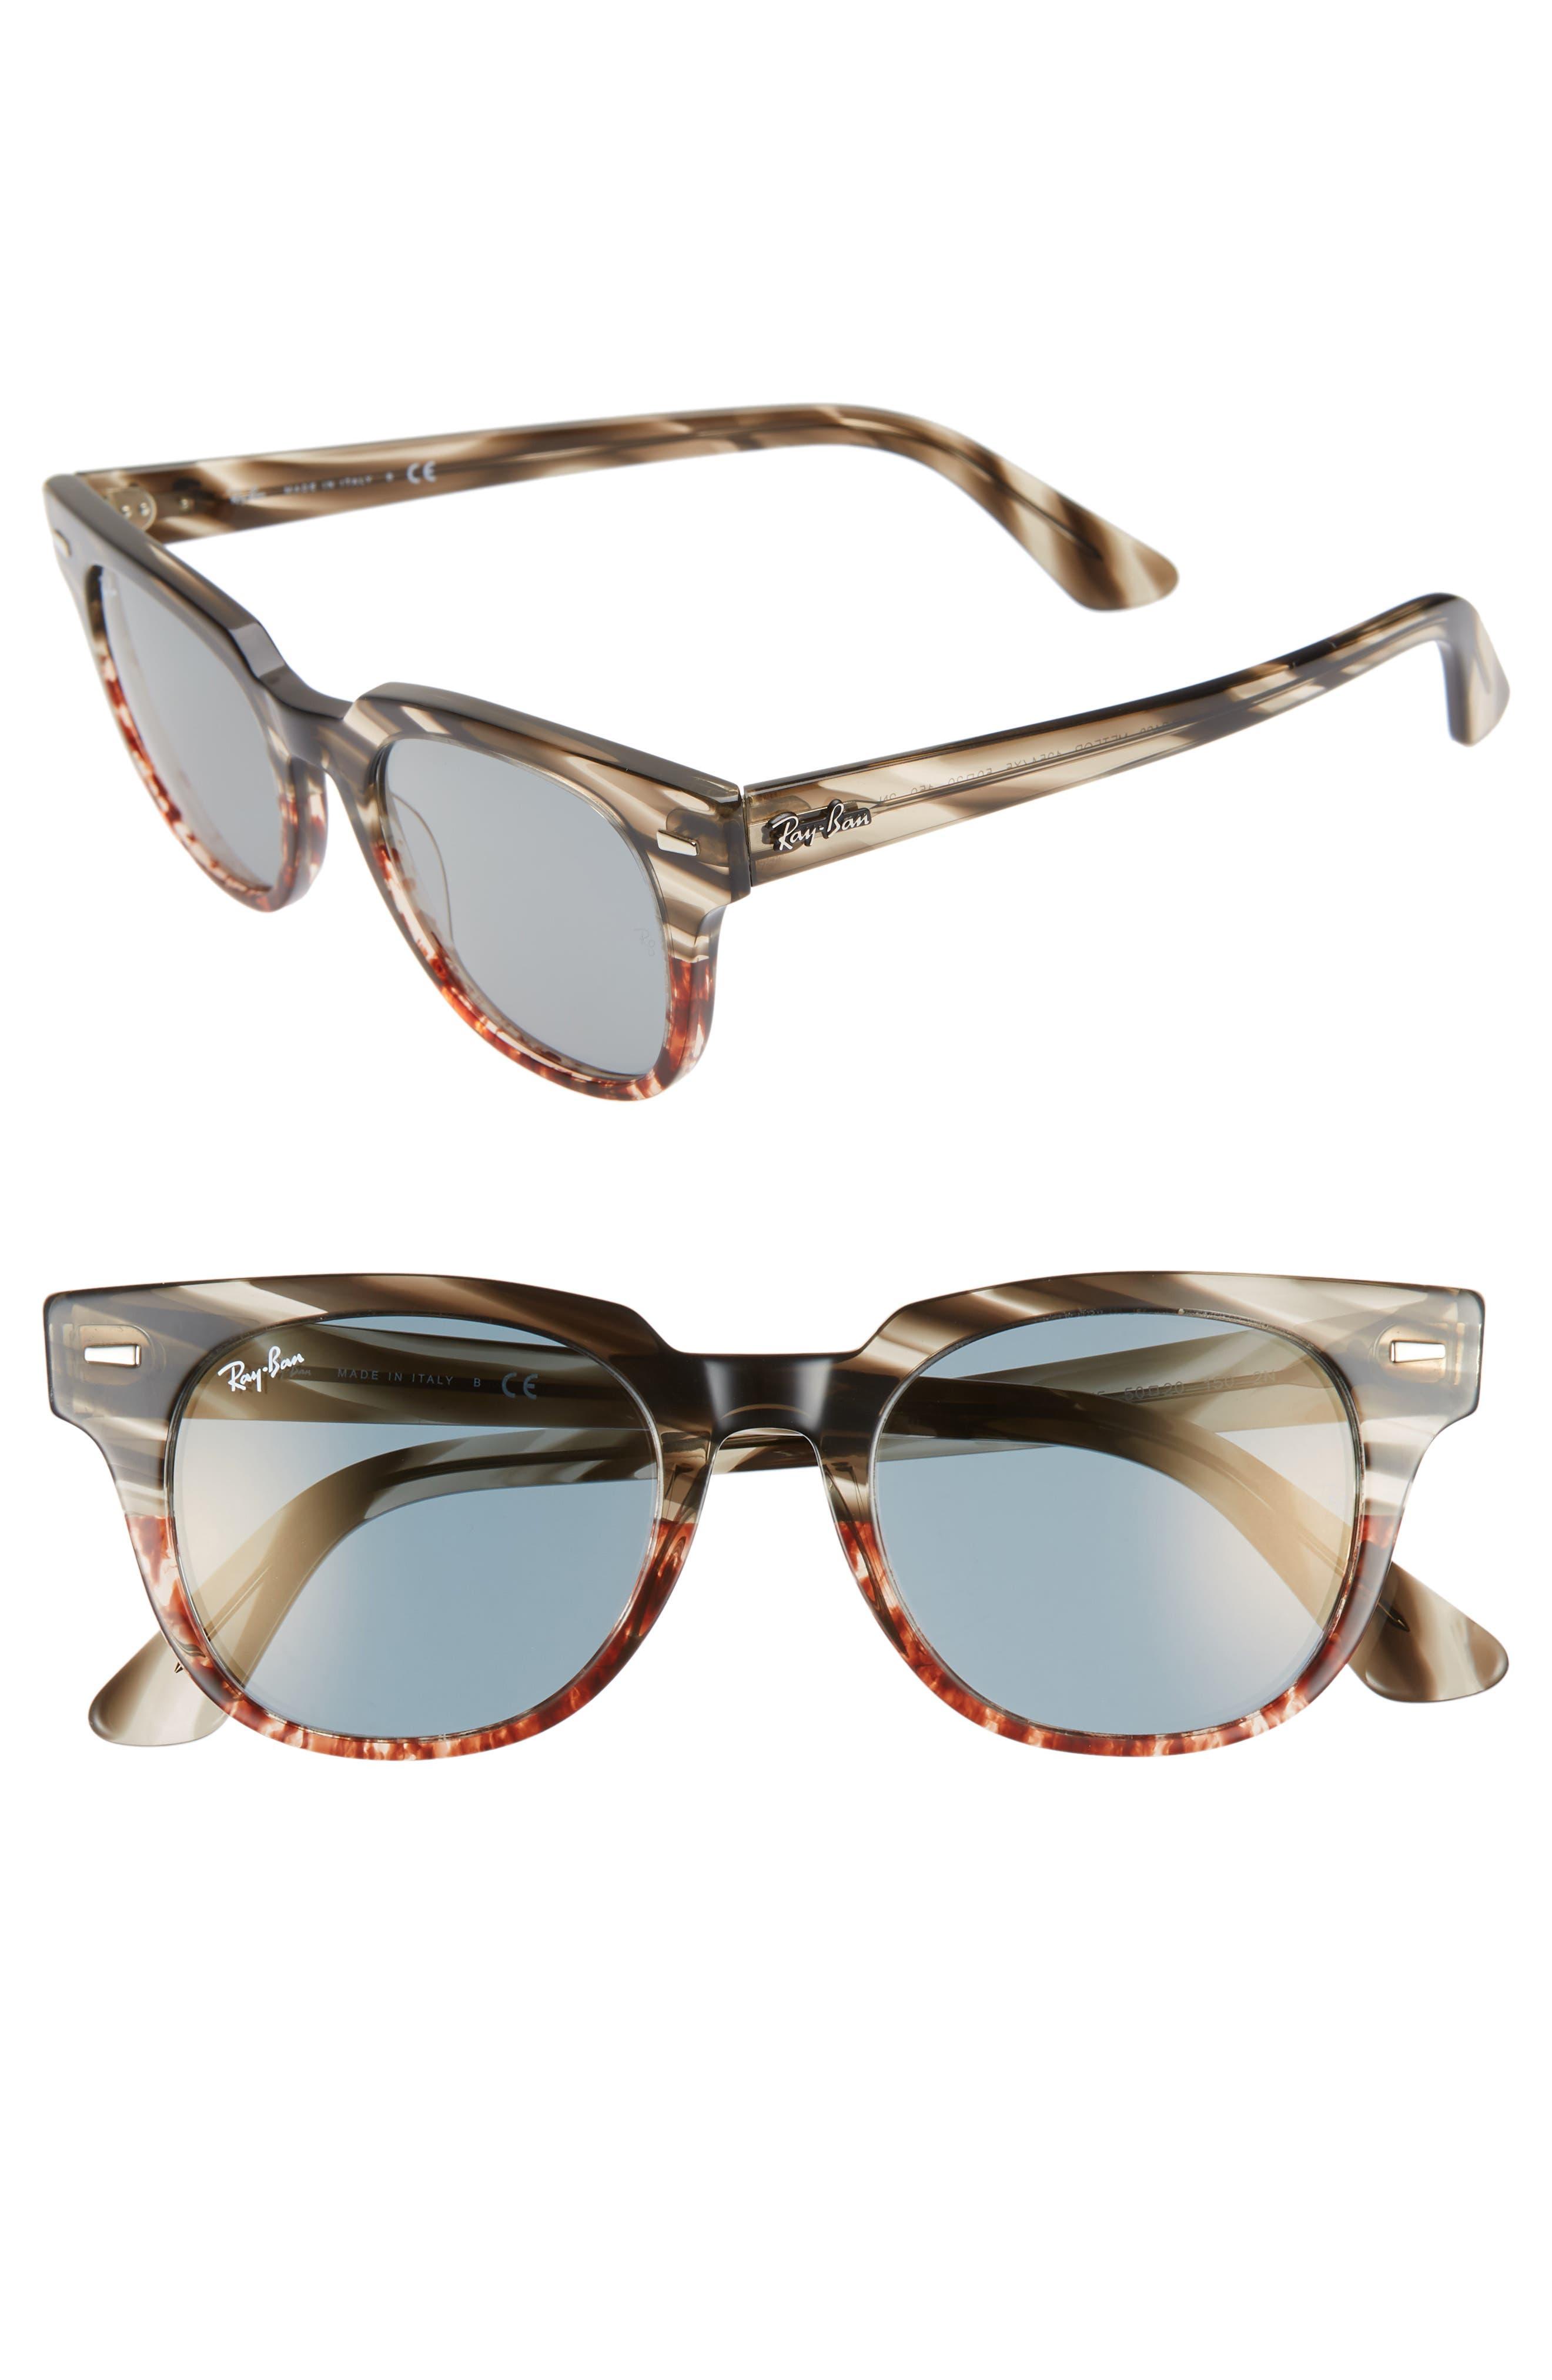 Ray-Ban Meteor 50Mm Mirrored Wayfarer Sunglasses - Gold Blue Mirror